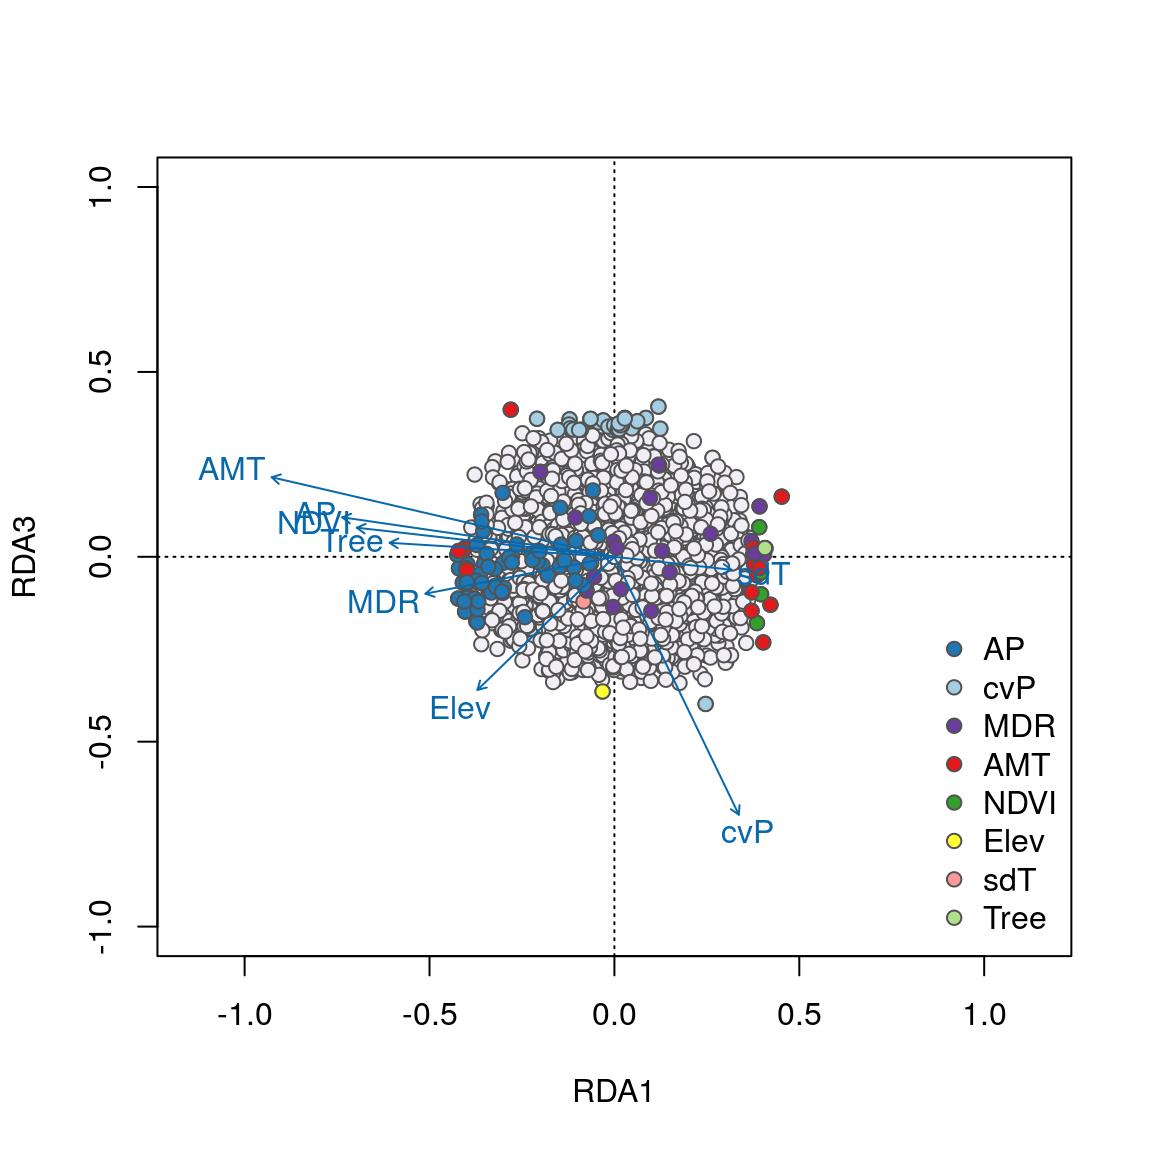 Detecting multilocus adaptation using Redundancy Analysis (RDA)